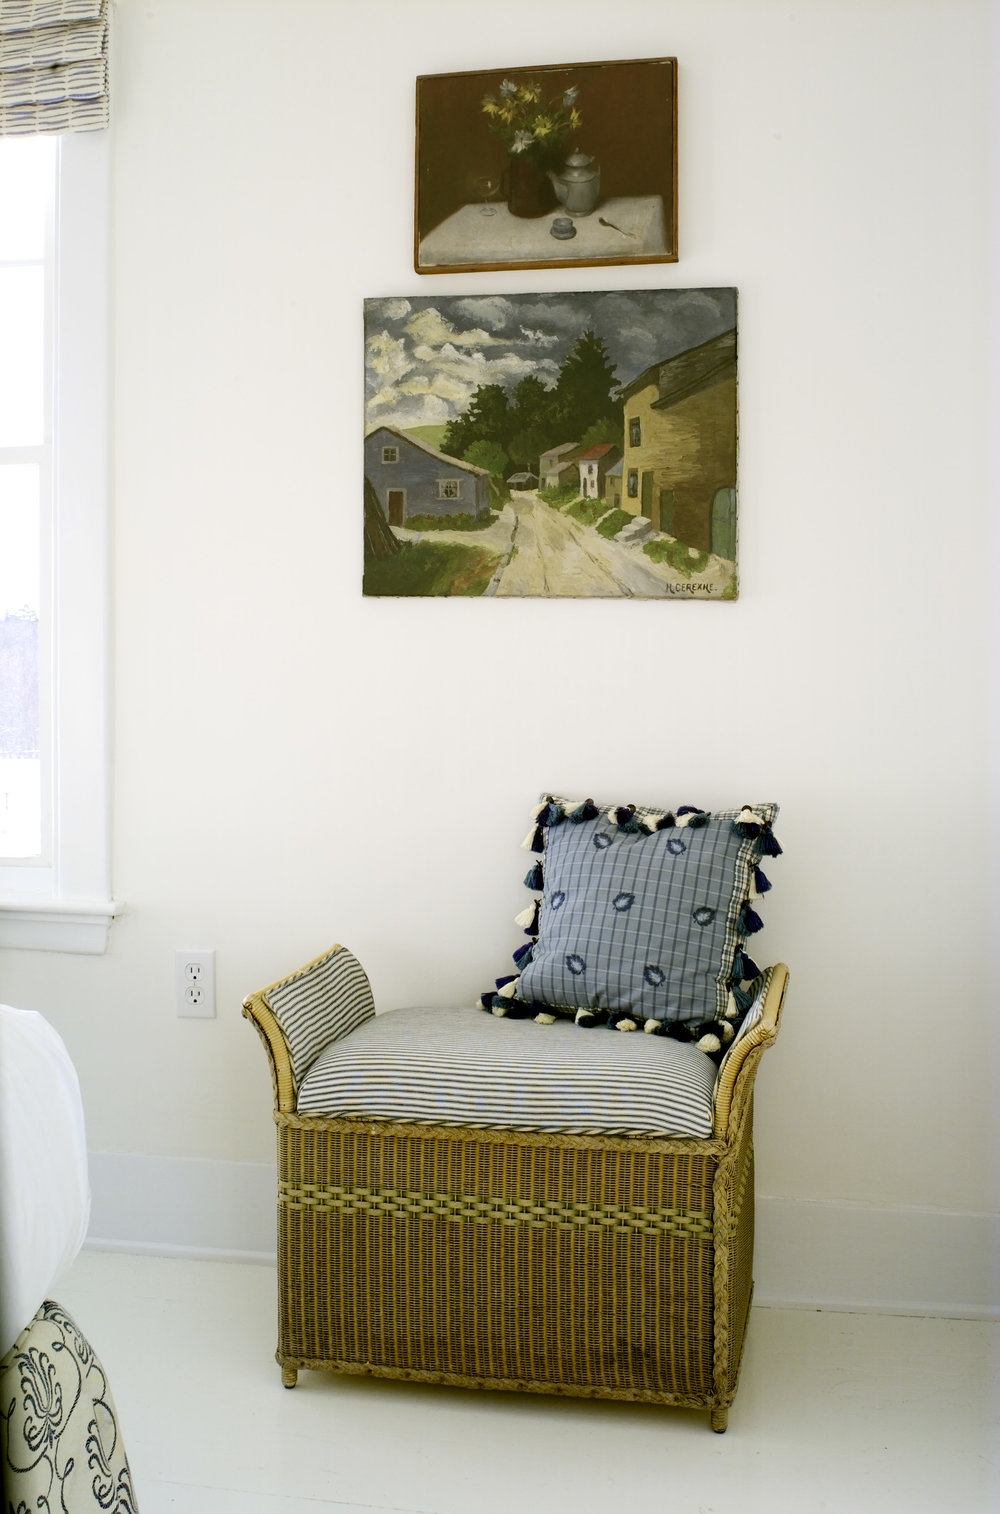 20031216.Chebeague.BlueBedroomWicker.jpg